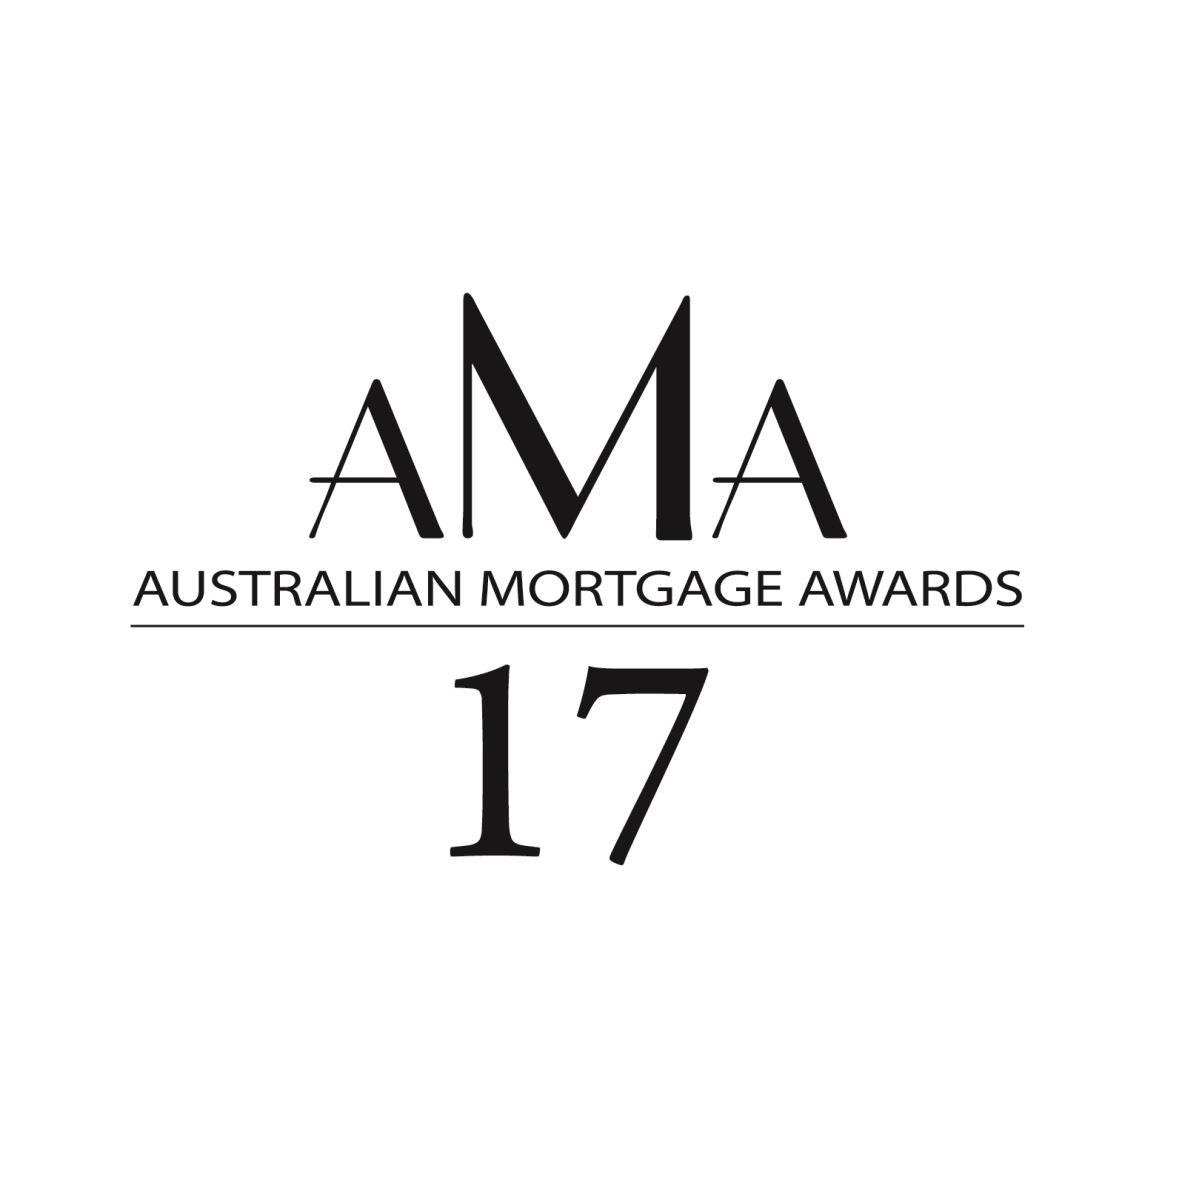 Australian Mortgage Awards category spotlight: Aggregators